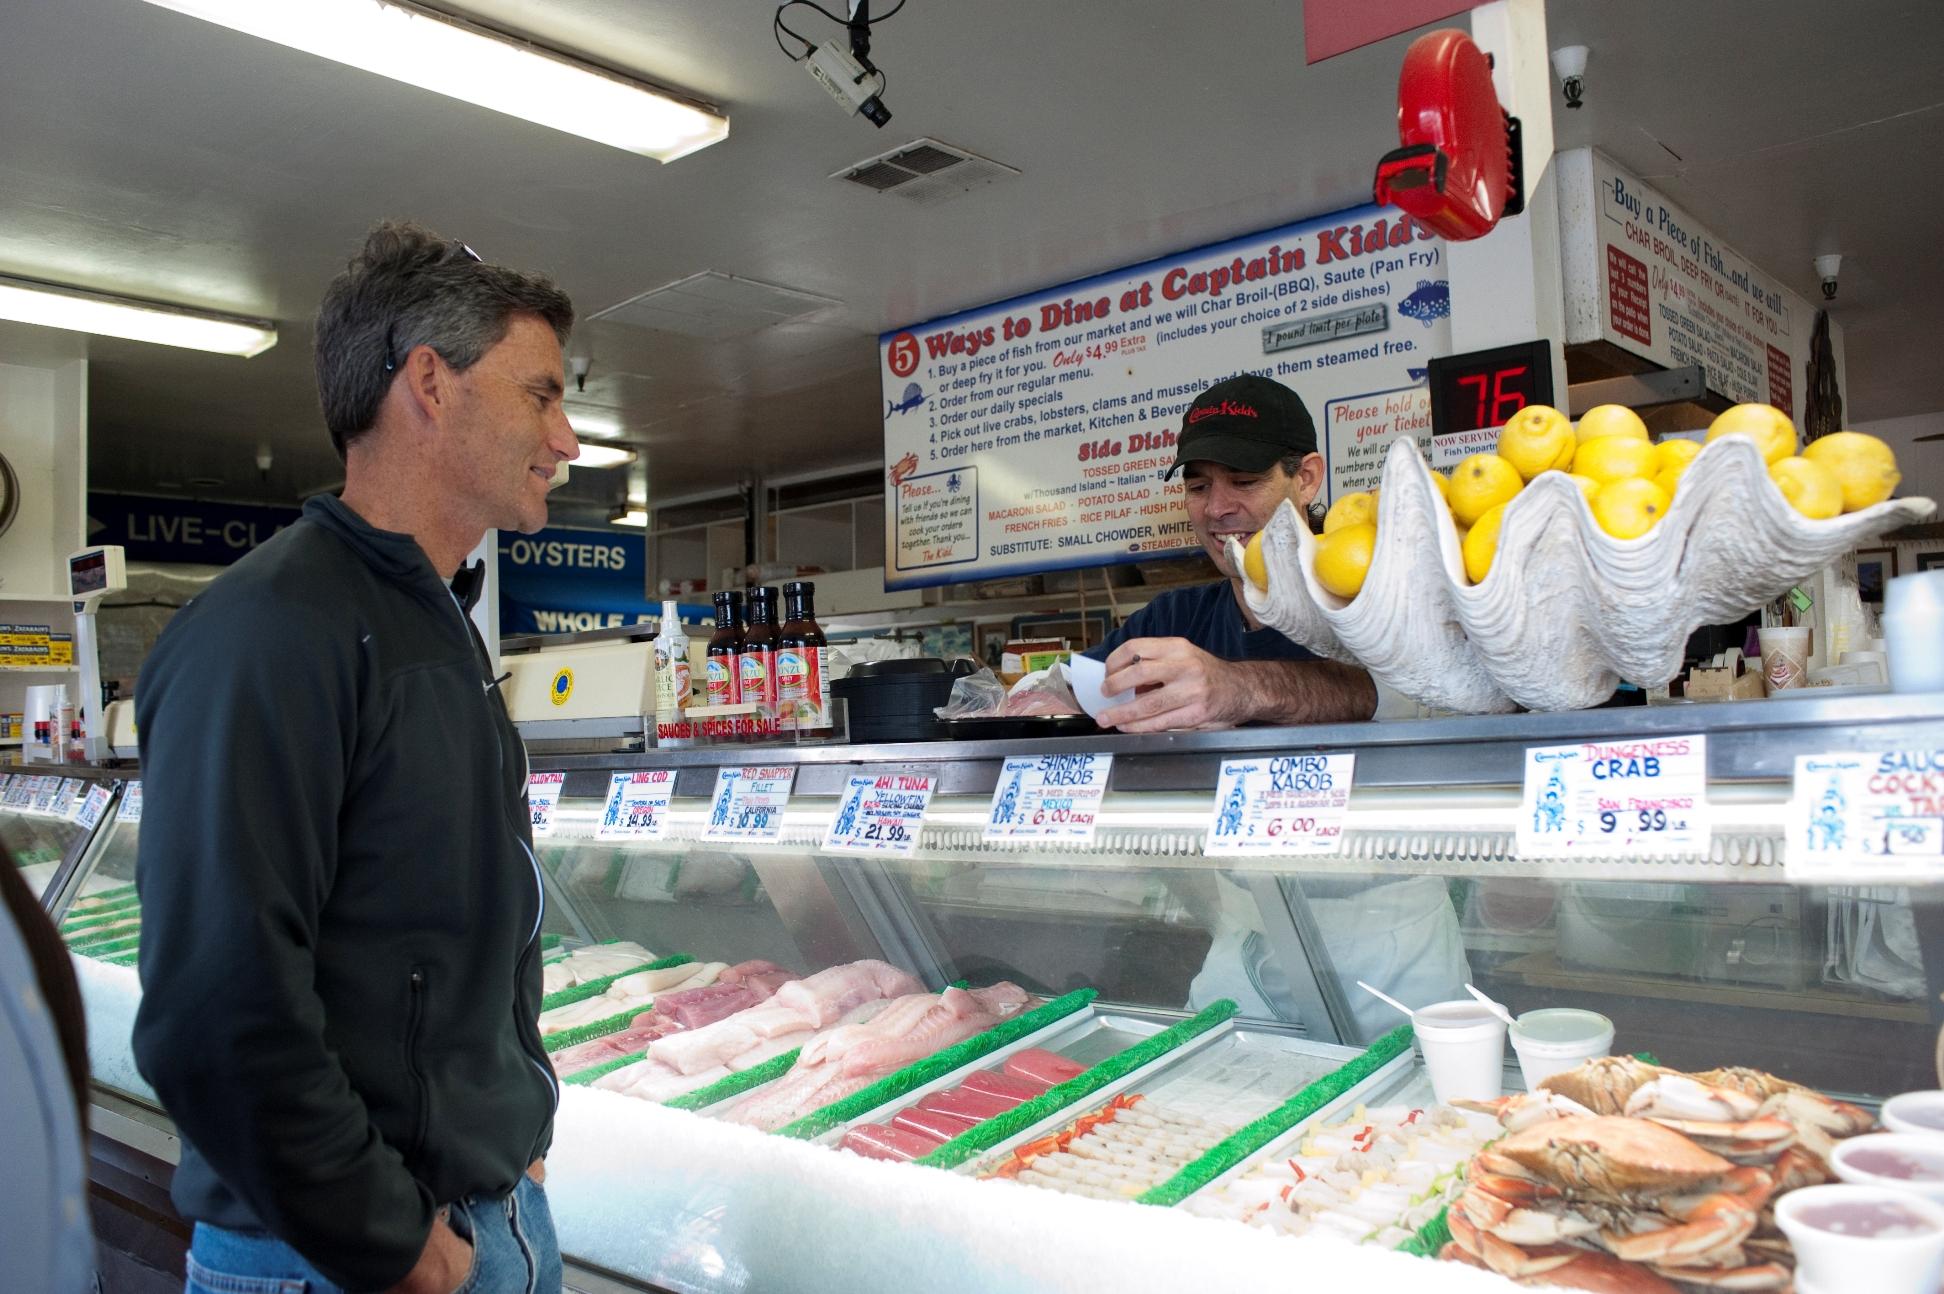 Best fish & chips: Captain Kidd's Fish Market